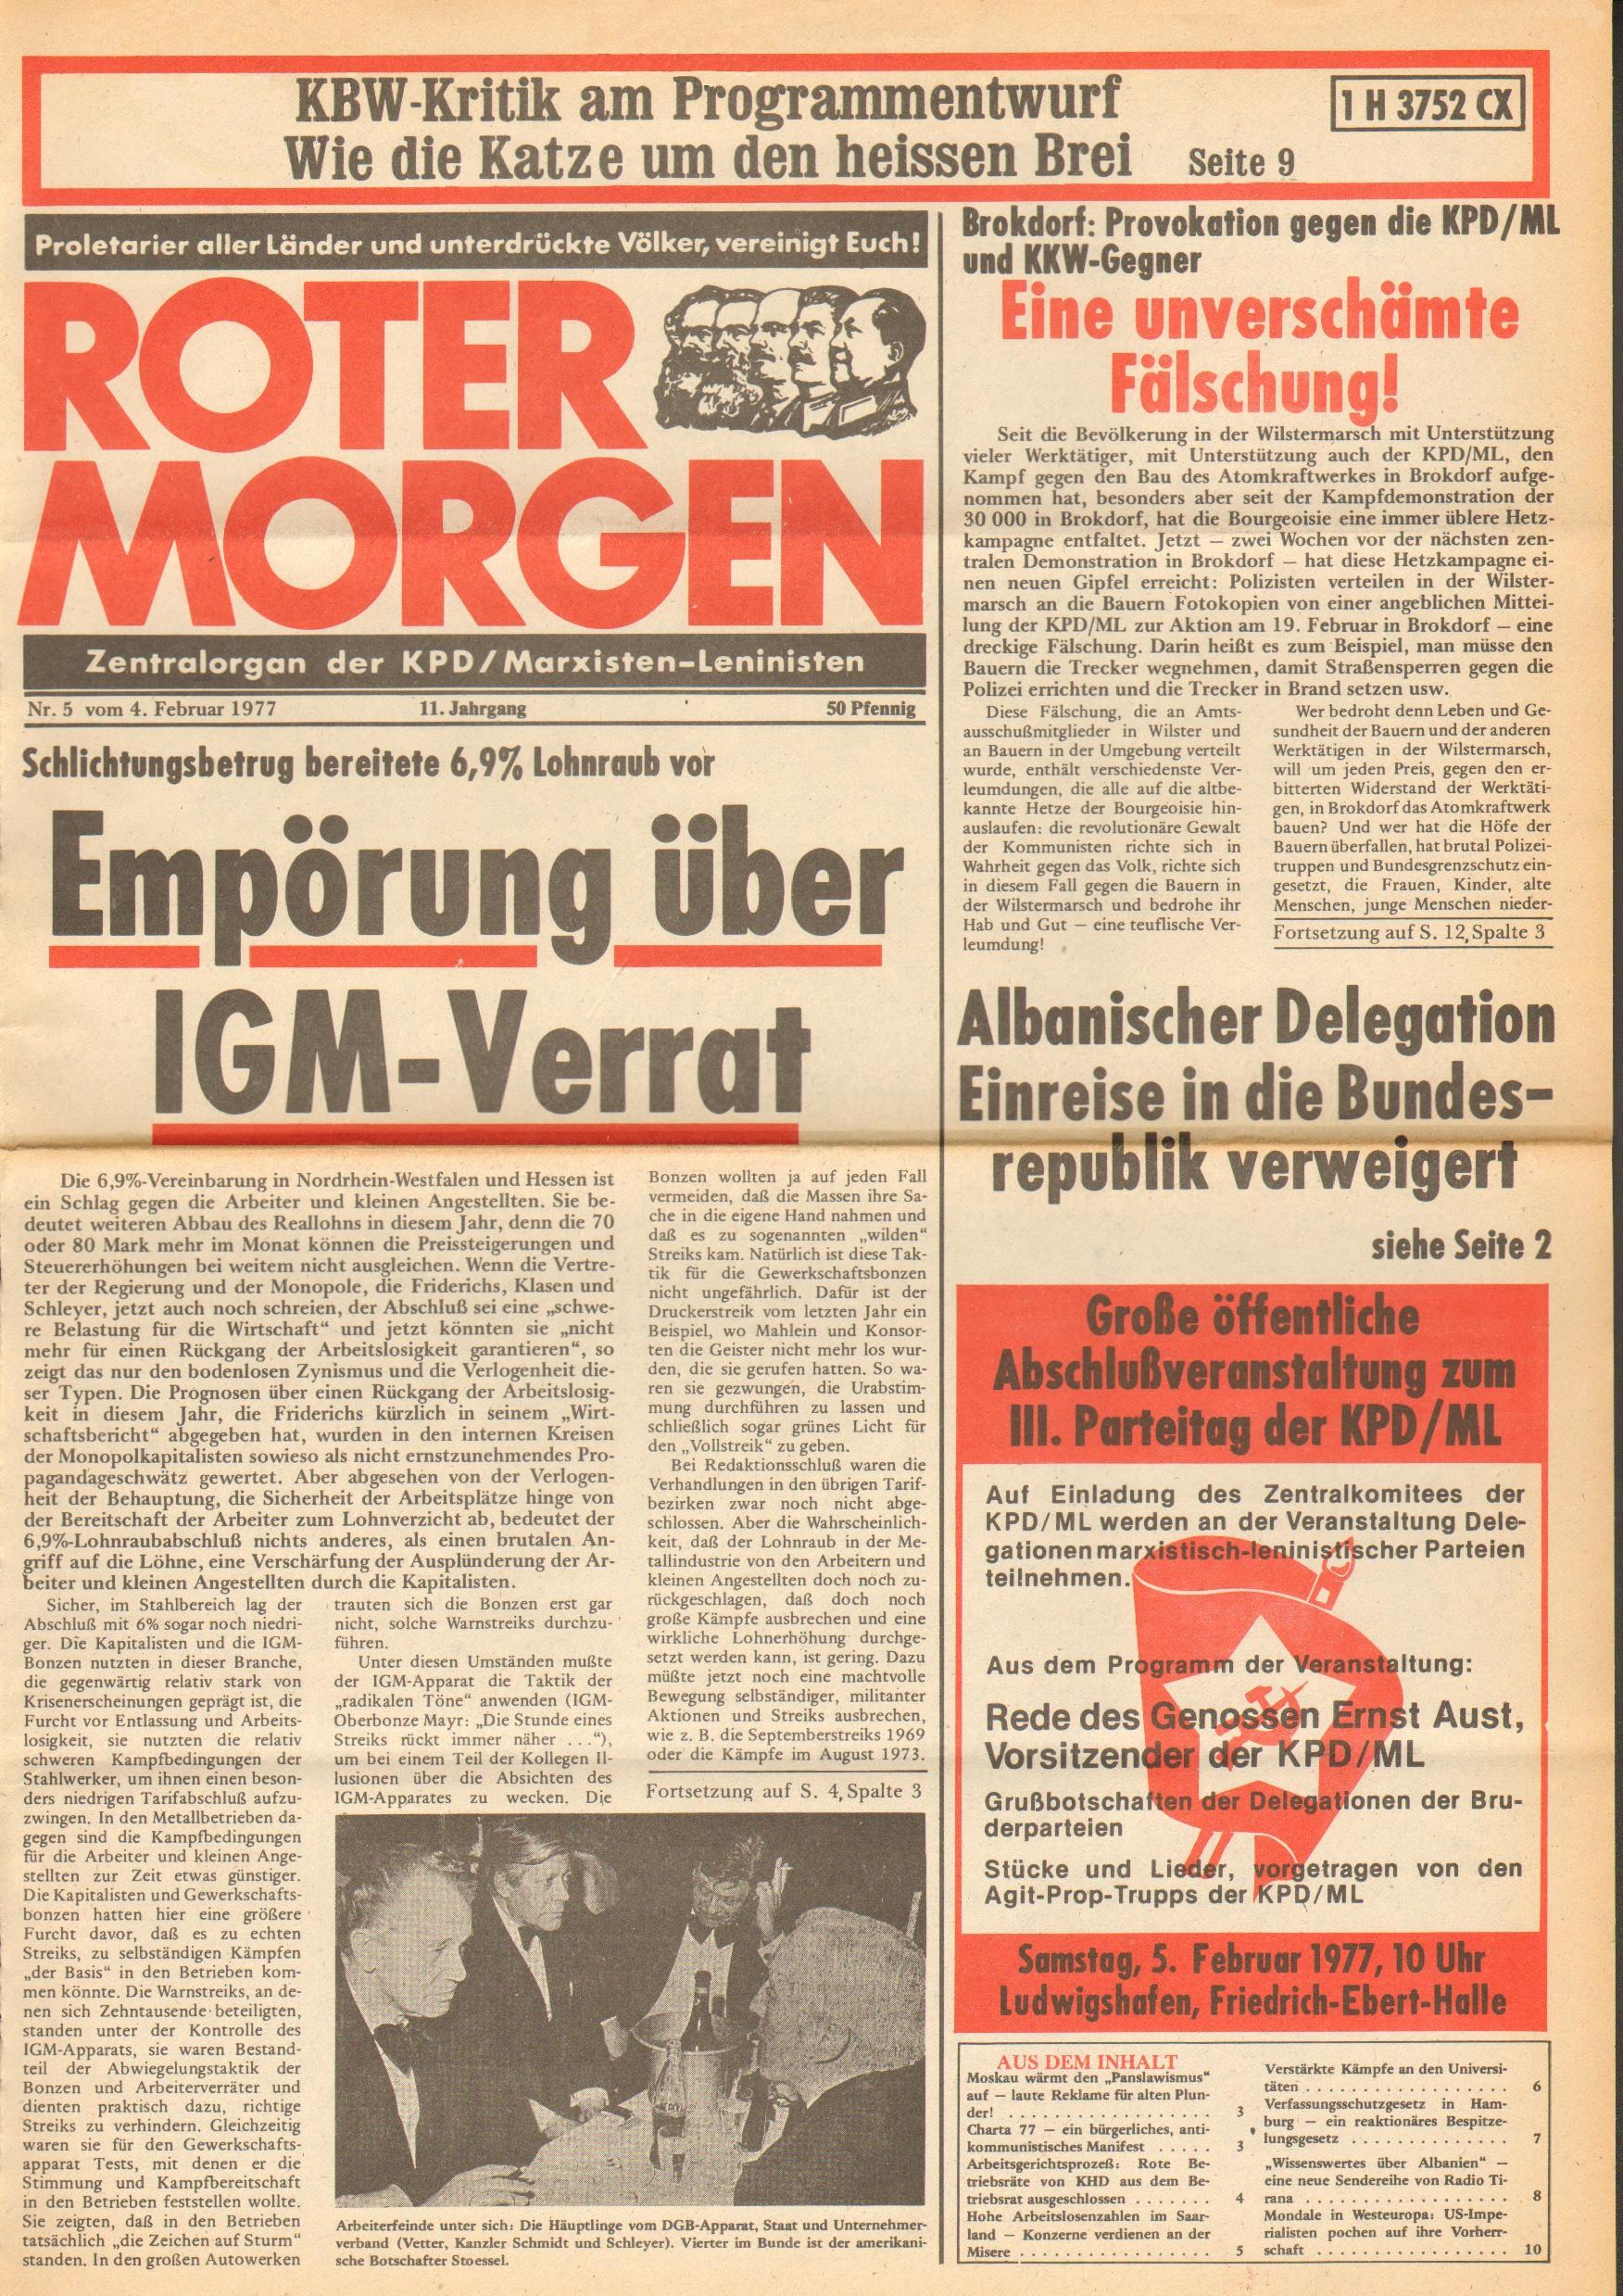 Roter Morgen, 11. Jg., 4. Februar 1977, Nr. 5, Seite 1